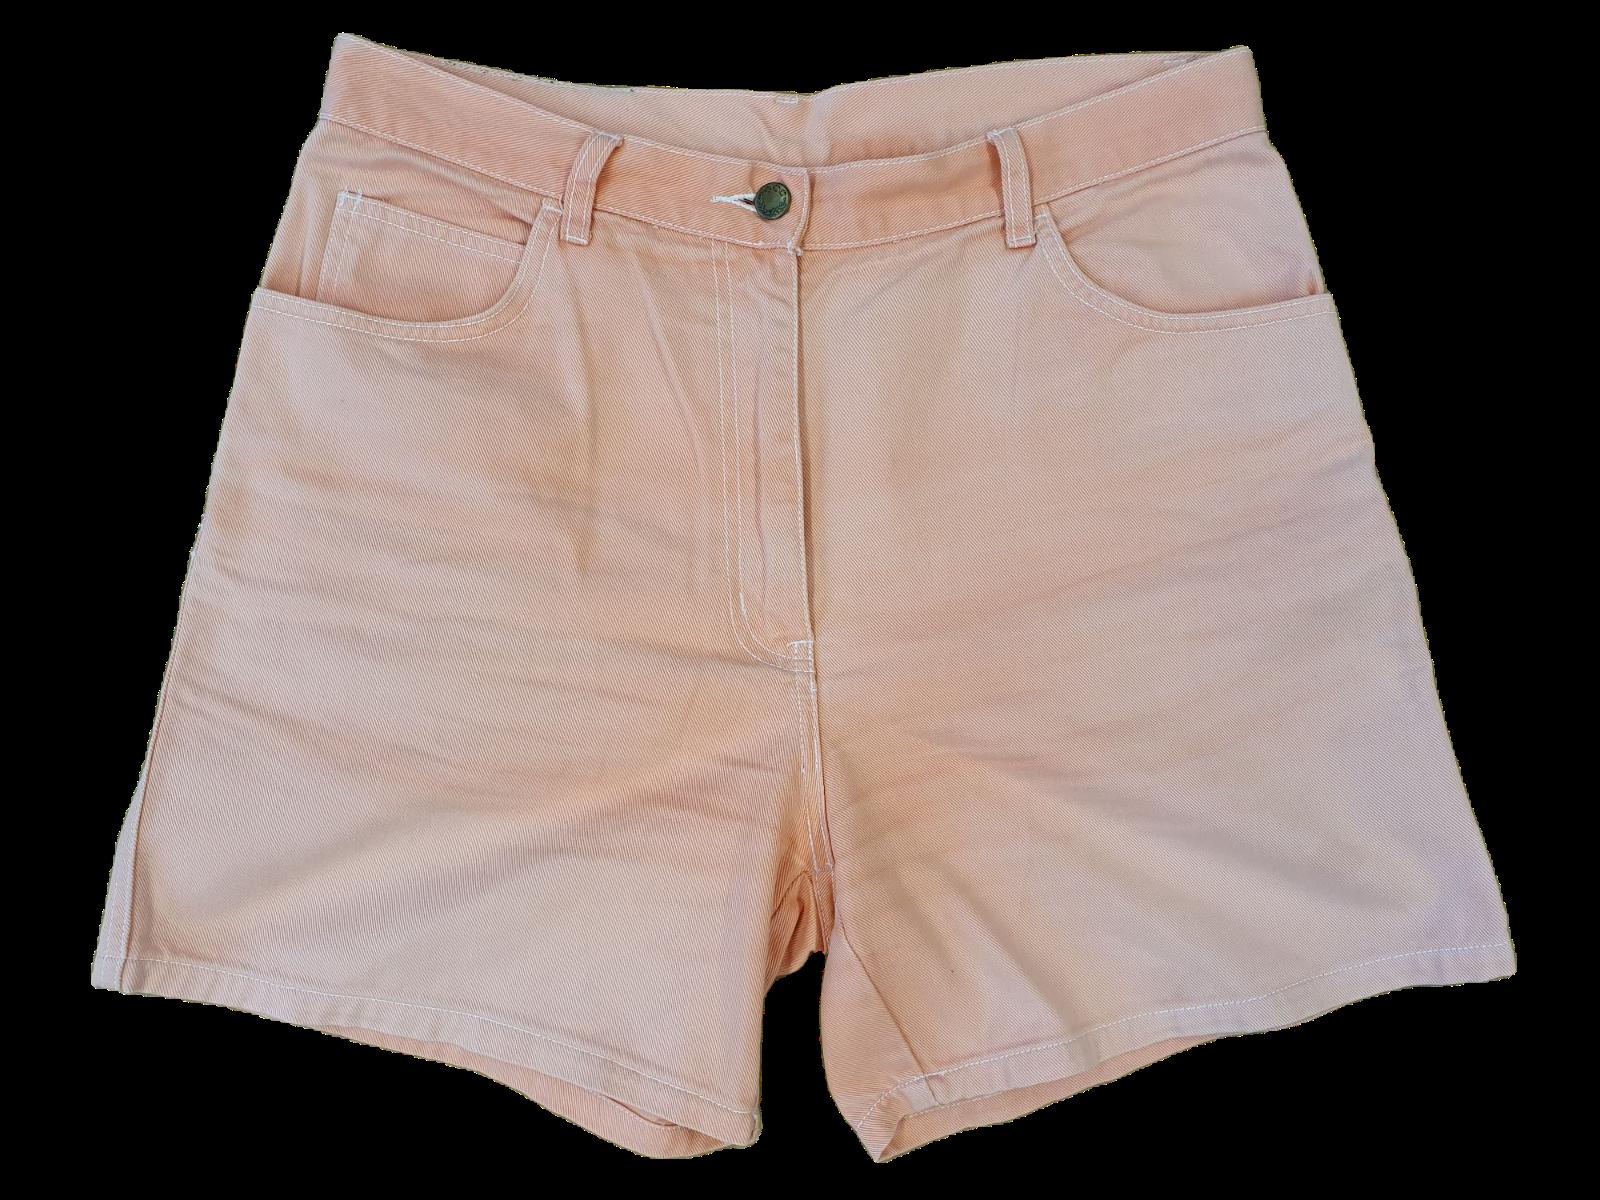 80s 90s Vintage Mom Jeans Shorts Größe EU 44 W32 Lachsfarben/Rosa (V8074)